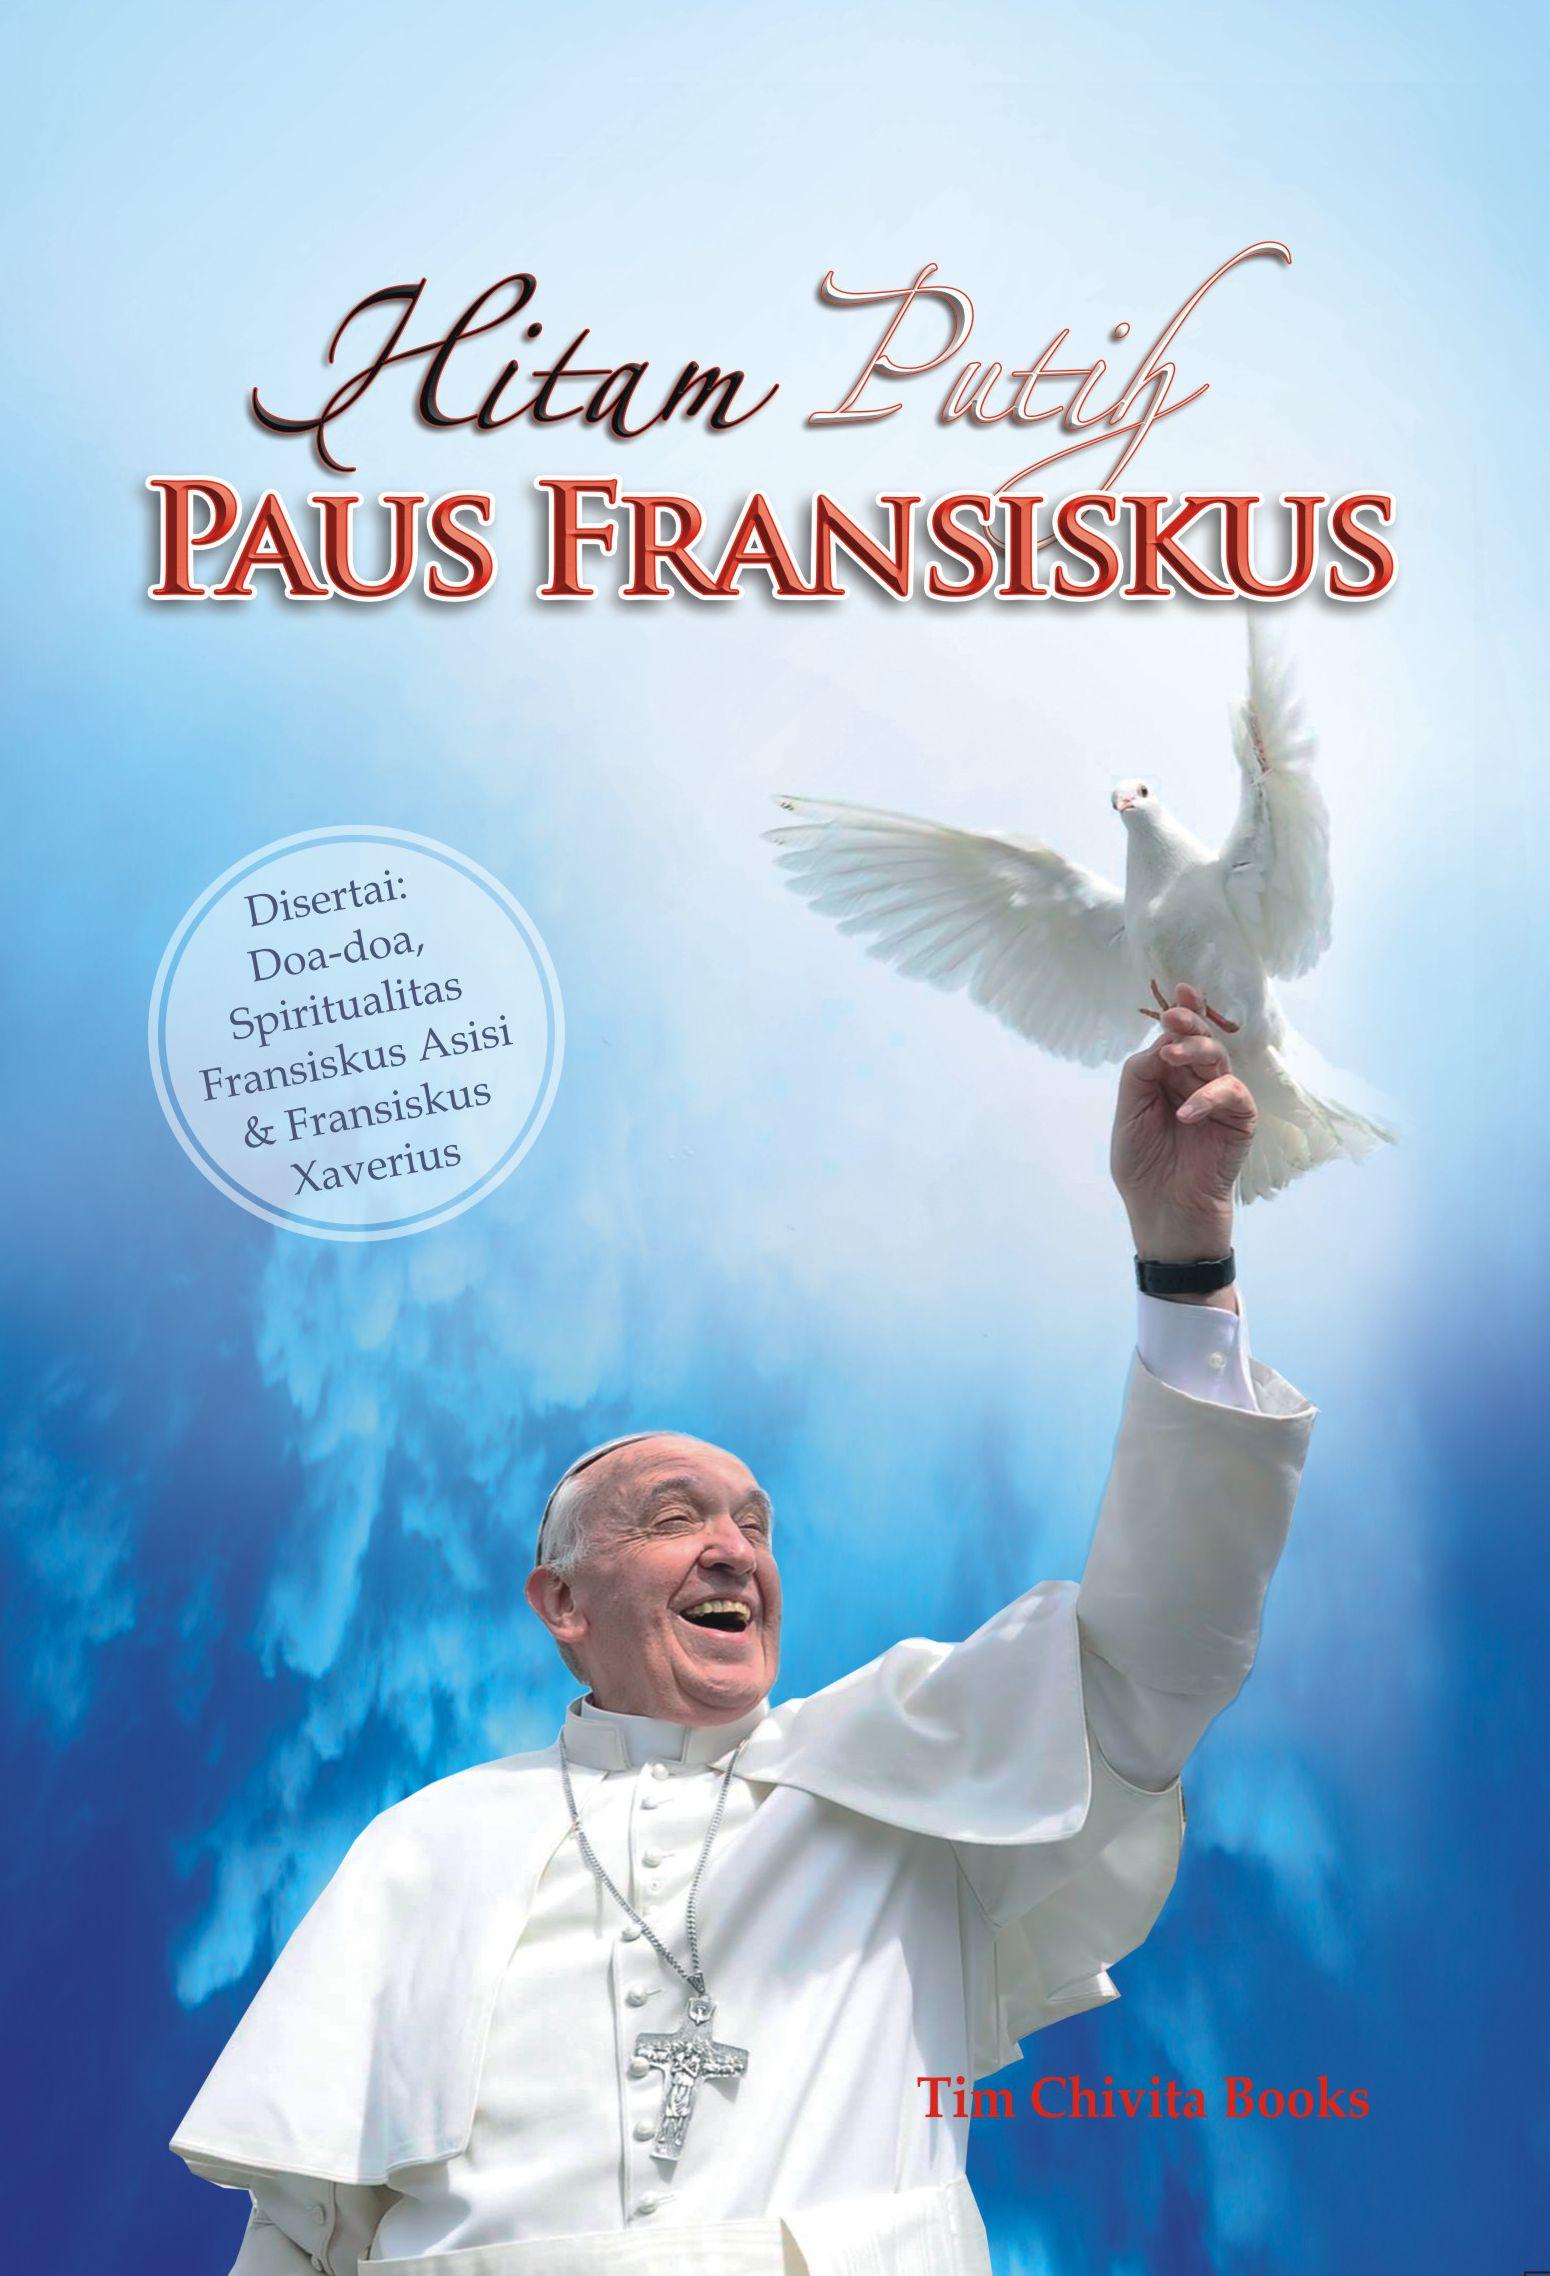 Paus Fransiskus - Hitam Putih PAUS FRANSISCUS